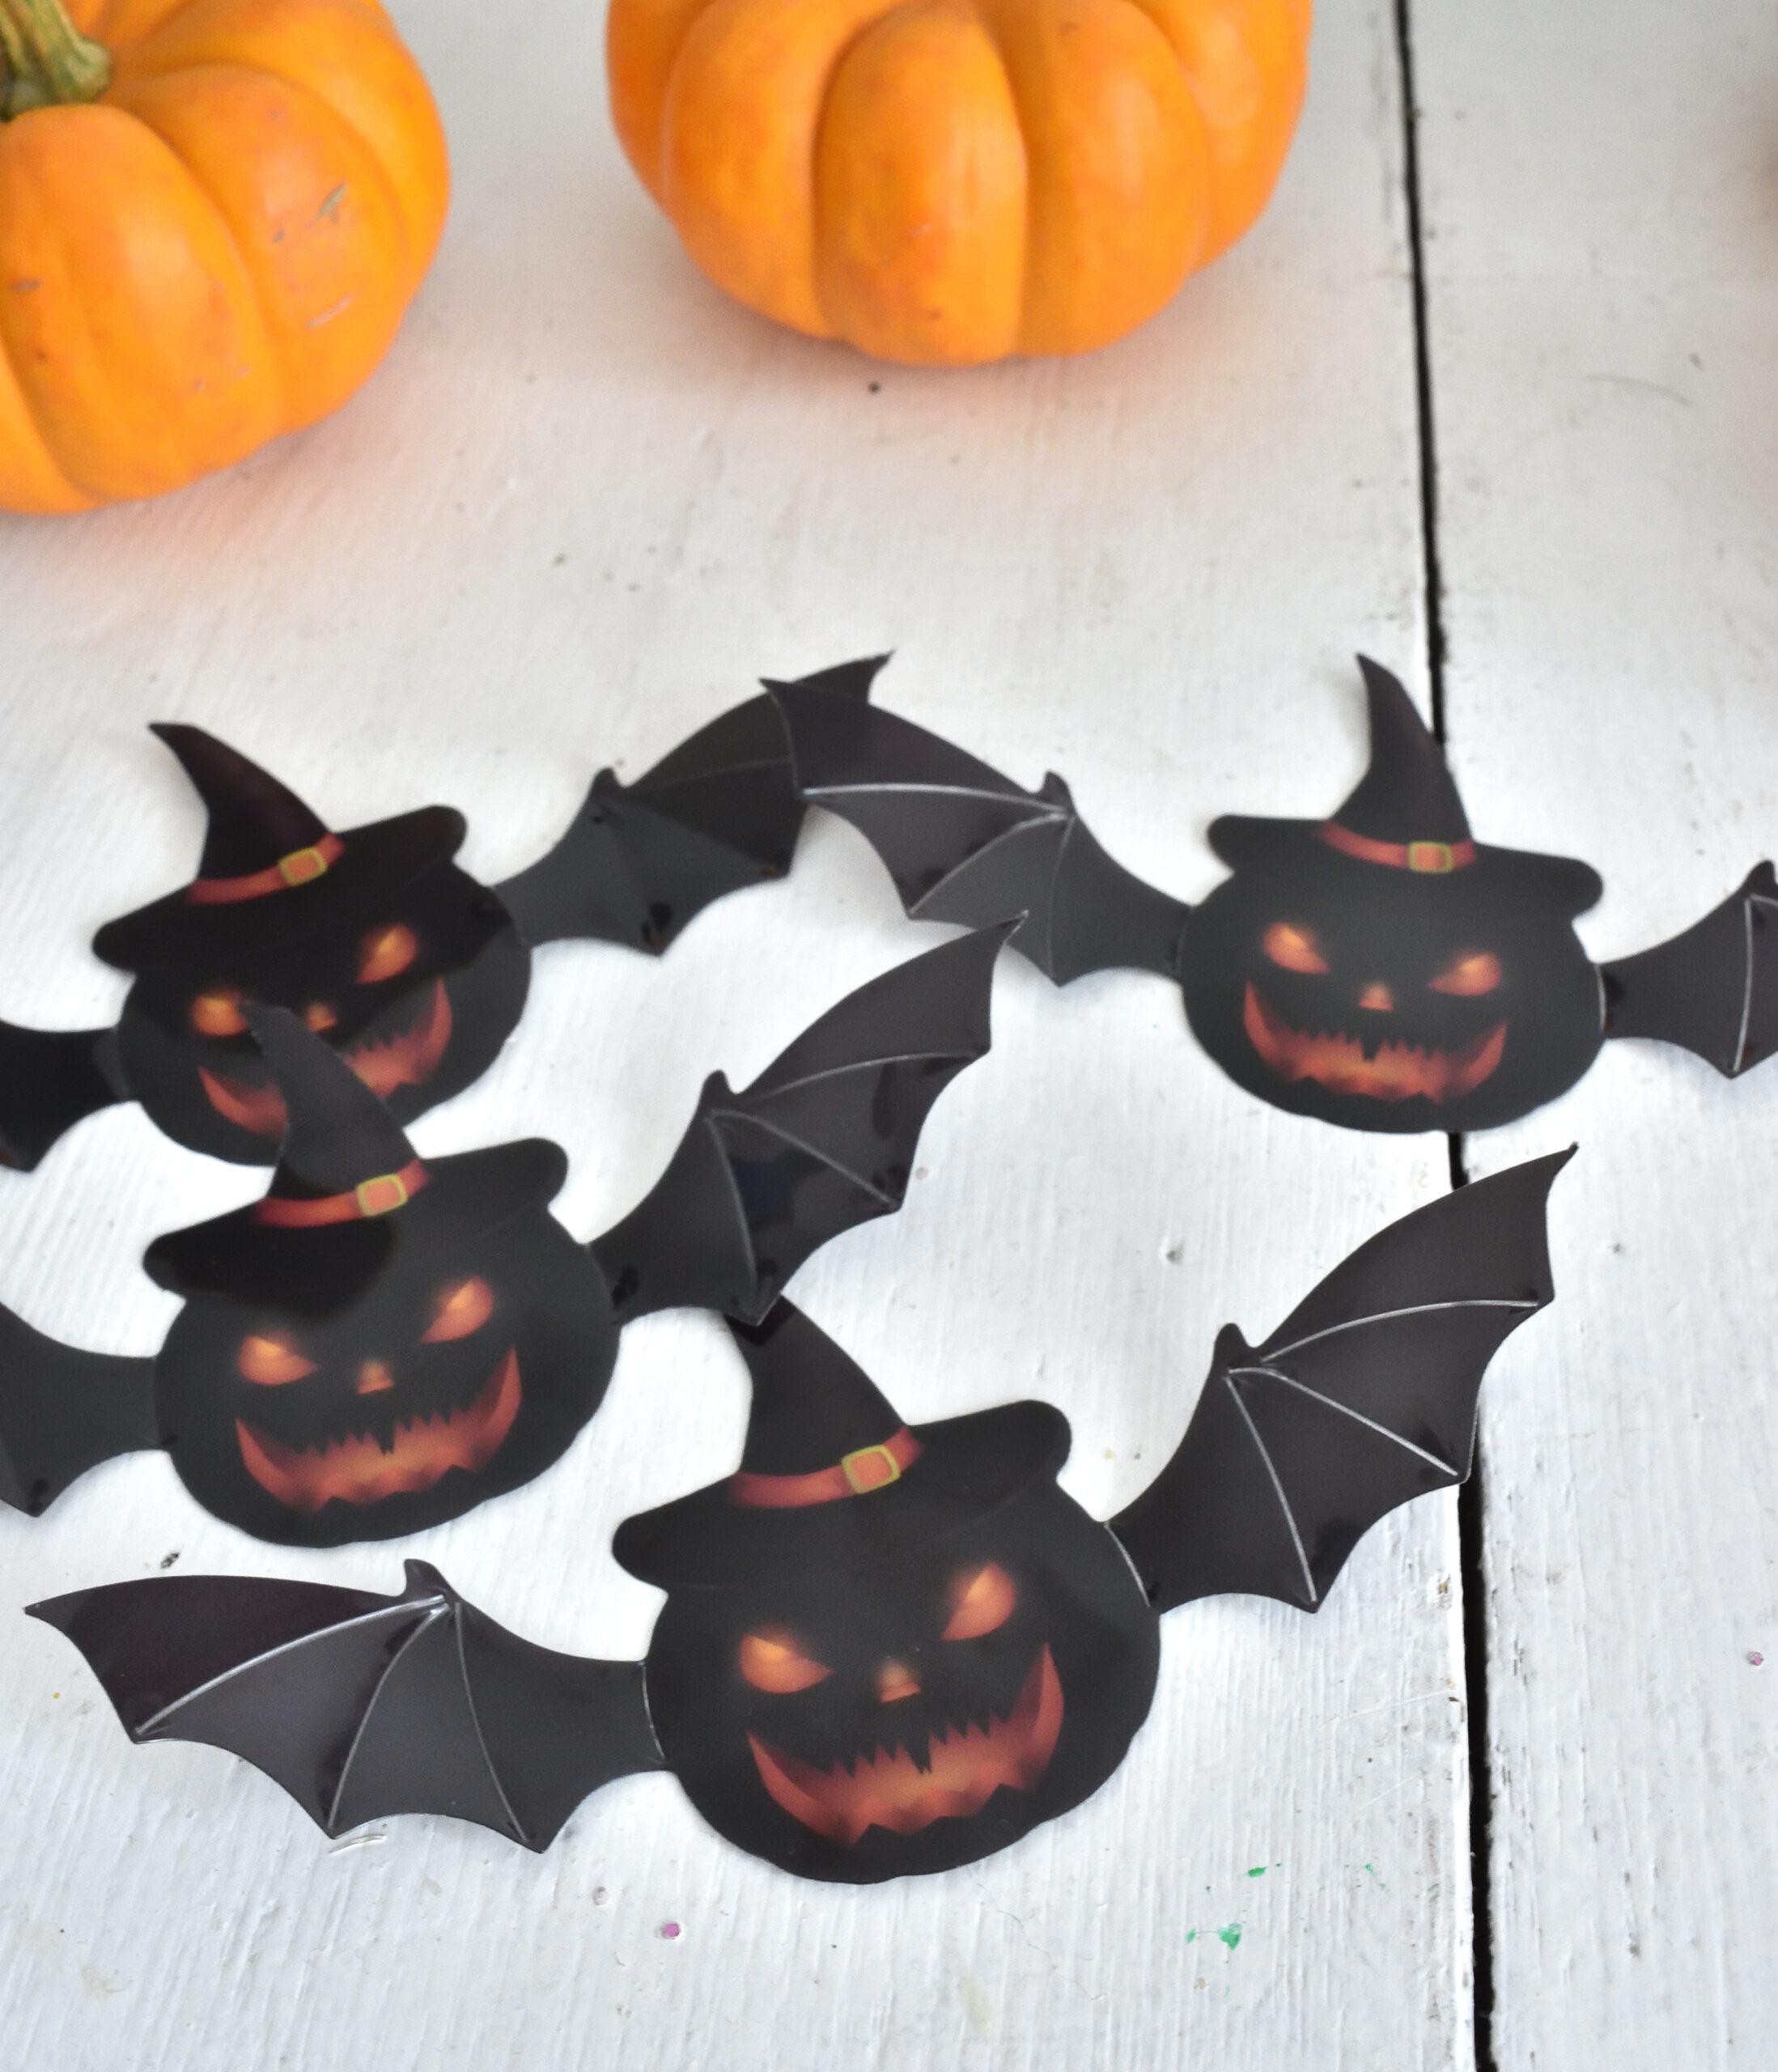 Mini Pumpkin Topiary Tutorial For Creating Cute Halloween Decorations